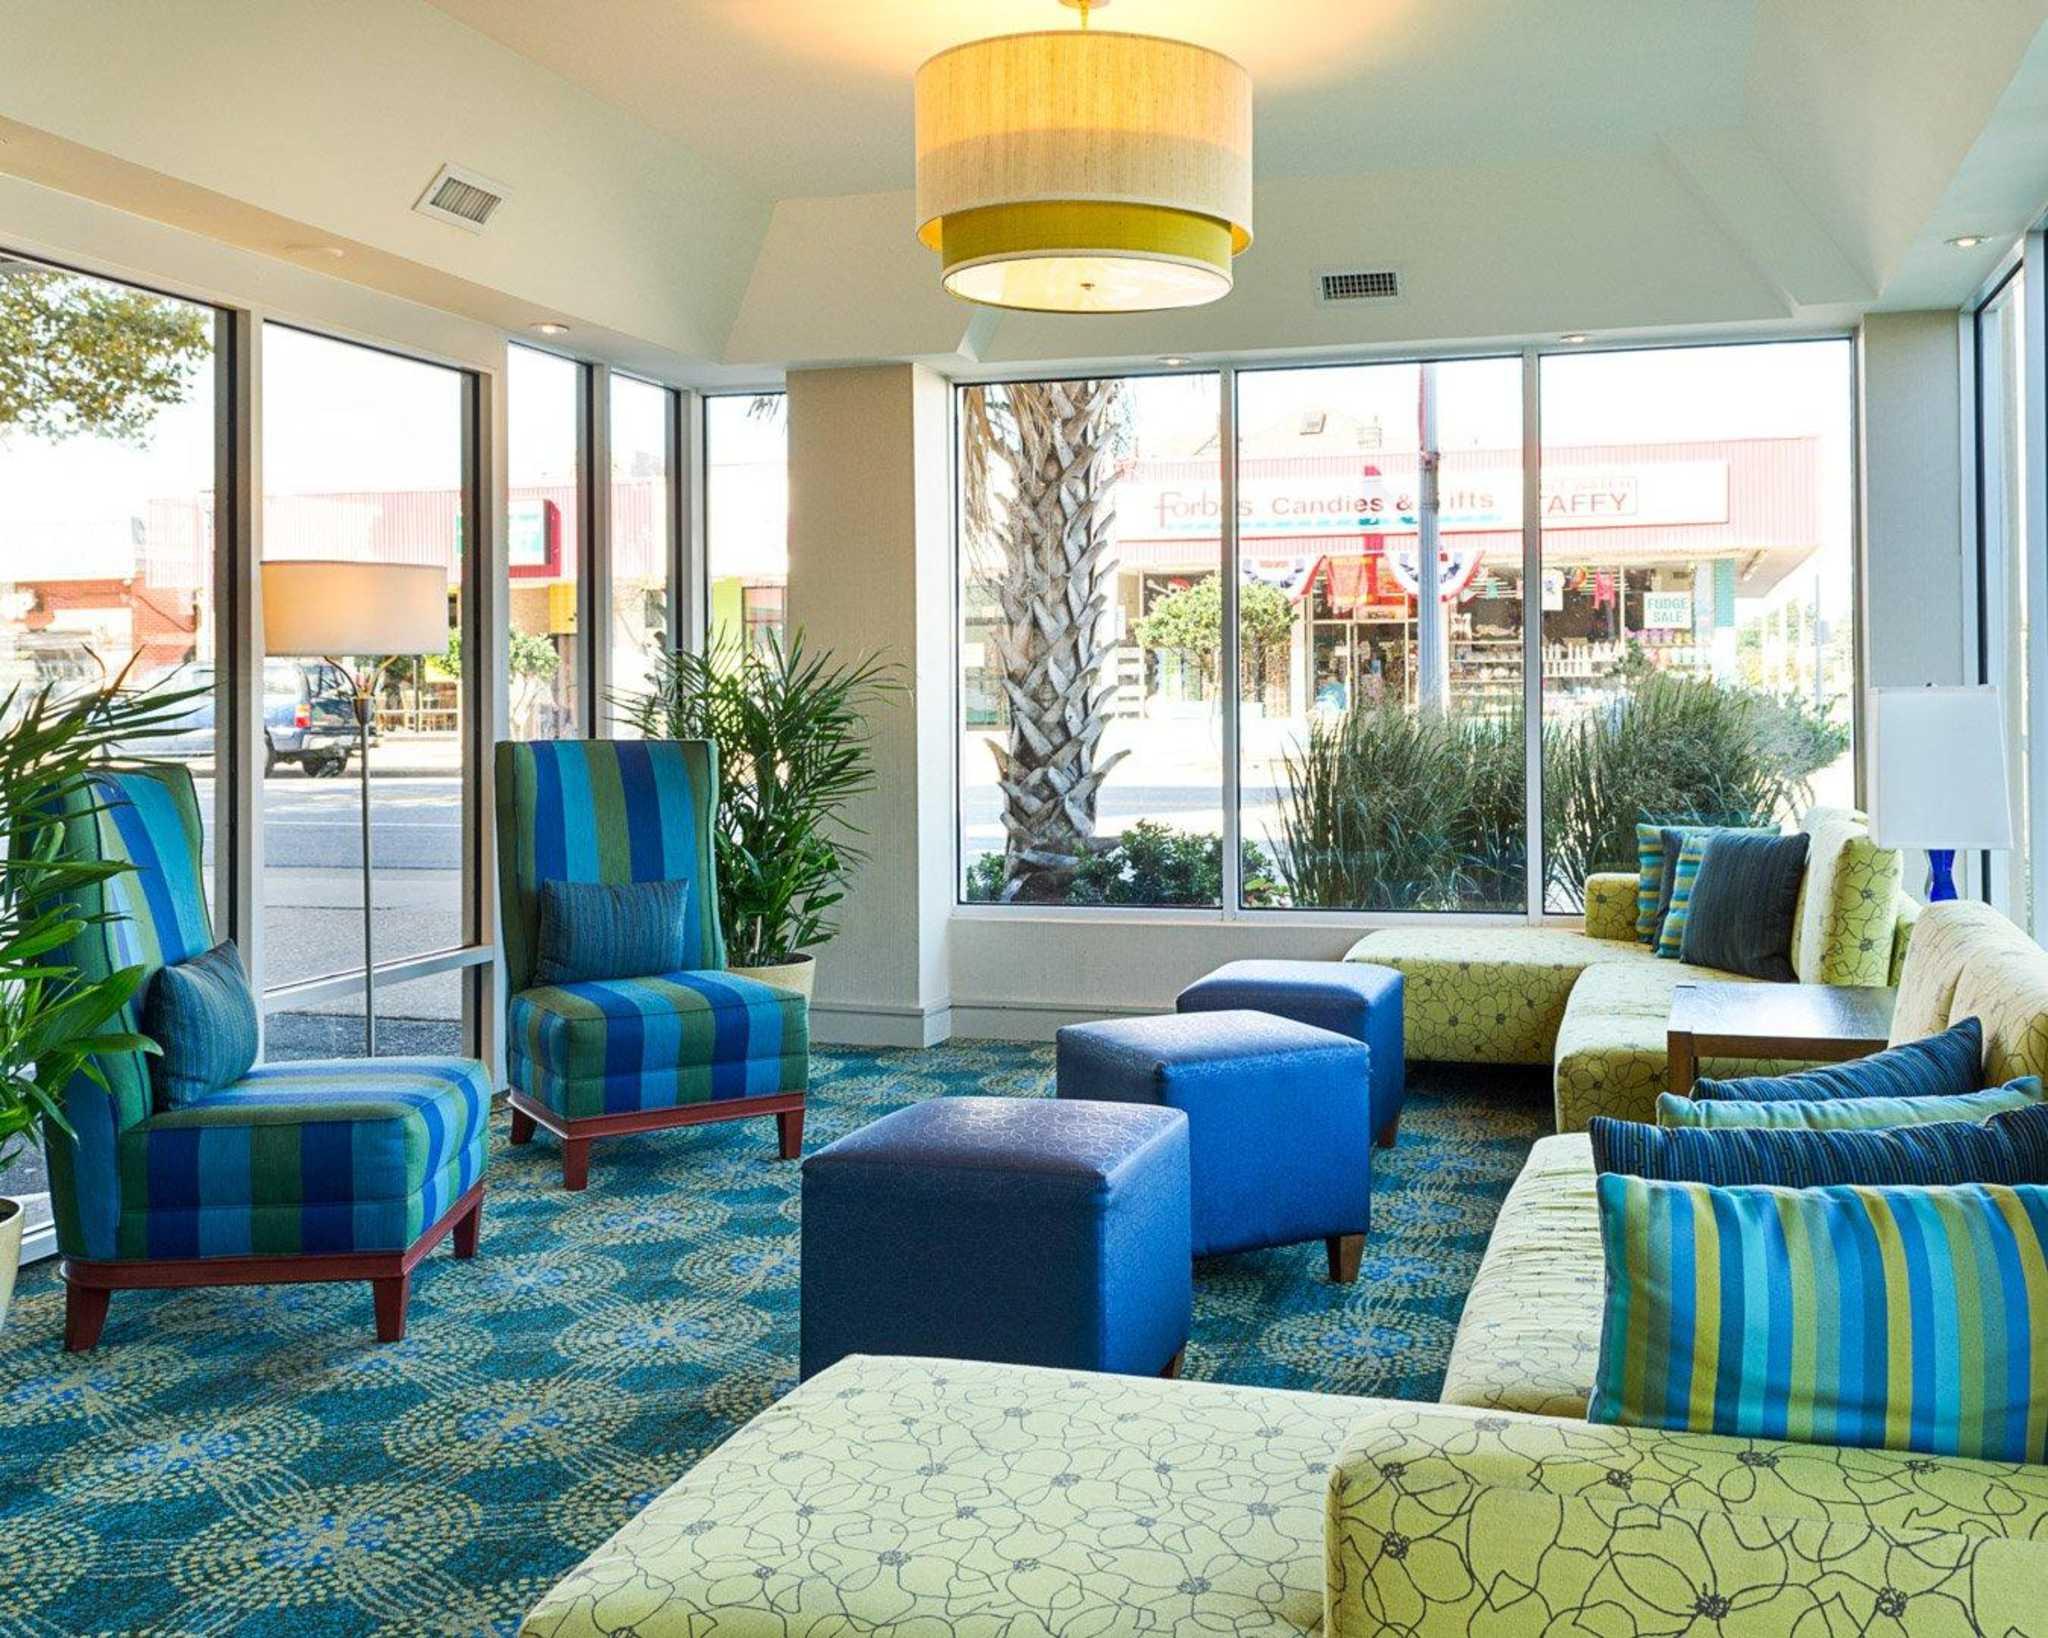 Comfort Suites Beachfront image 10